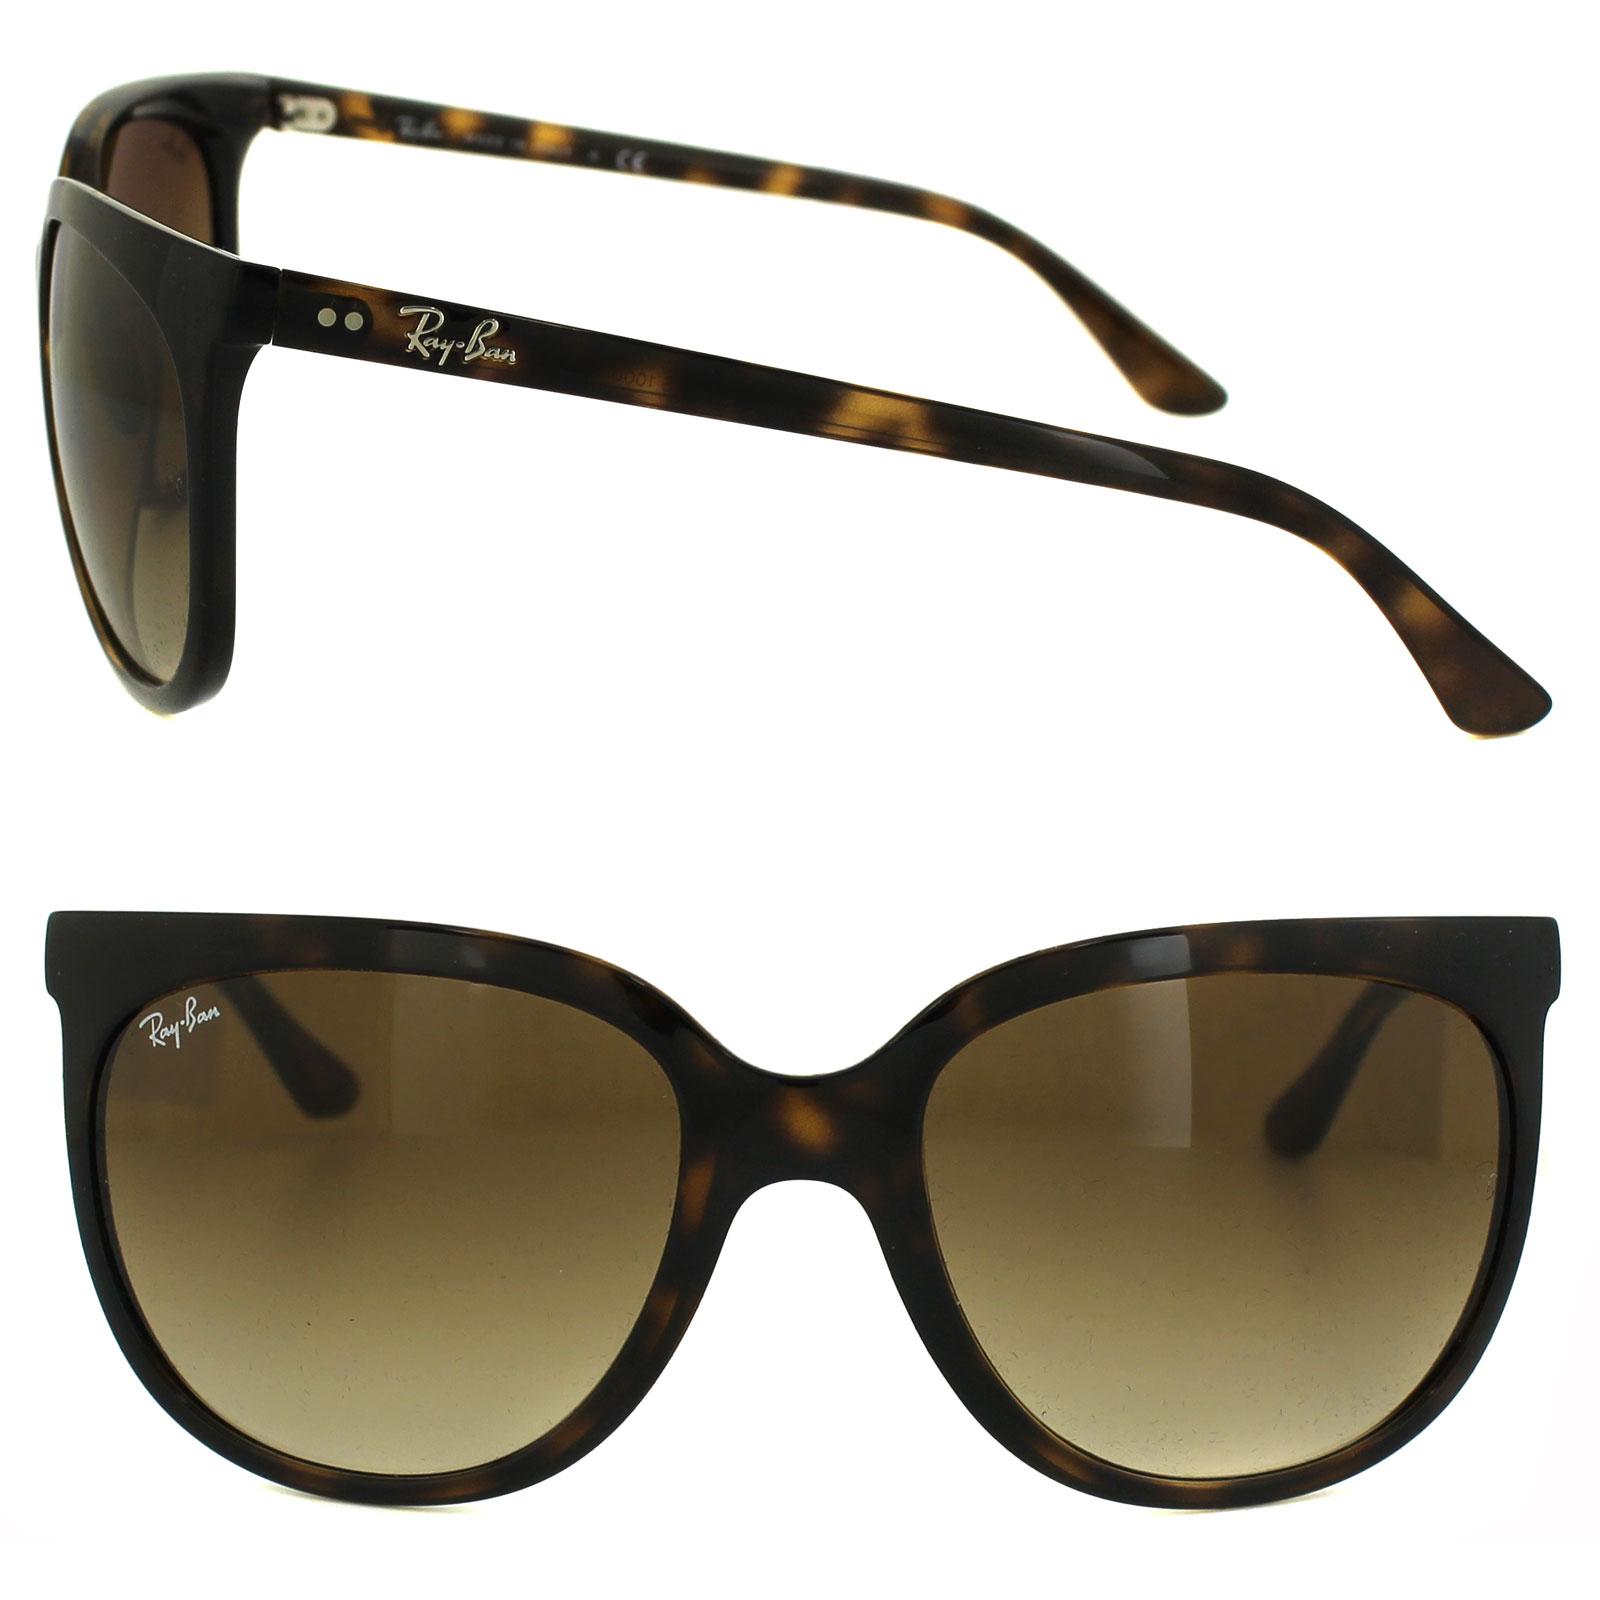 8149696572f ... sale sentinel rayban sunglasses cats 1000 4126 havana brown gradient  dfdf0 87922